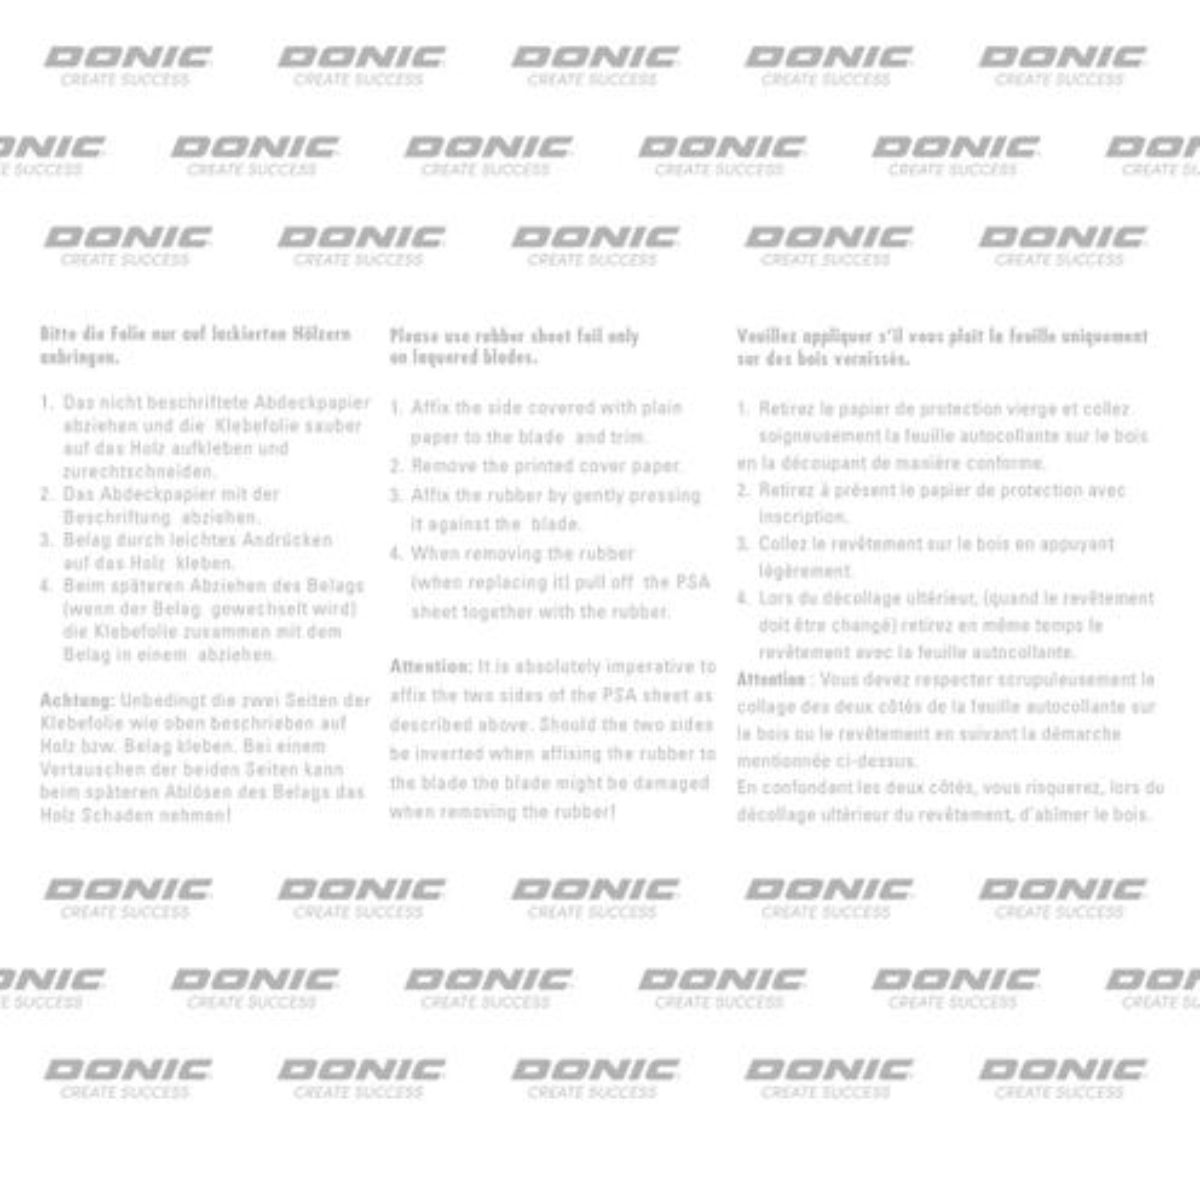 Donic Glue Sheet